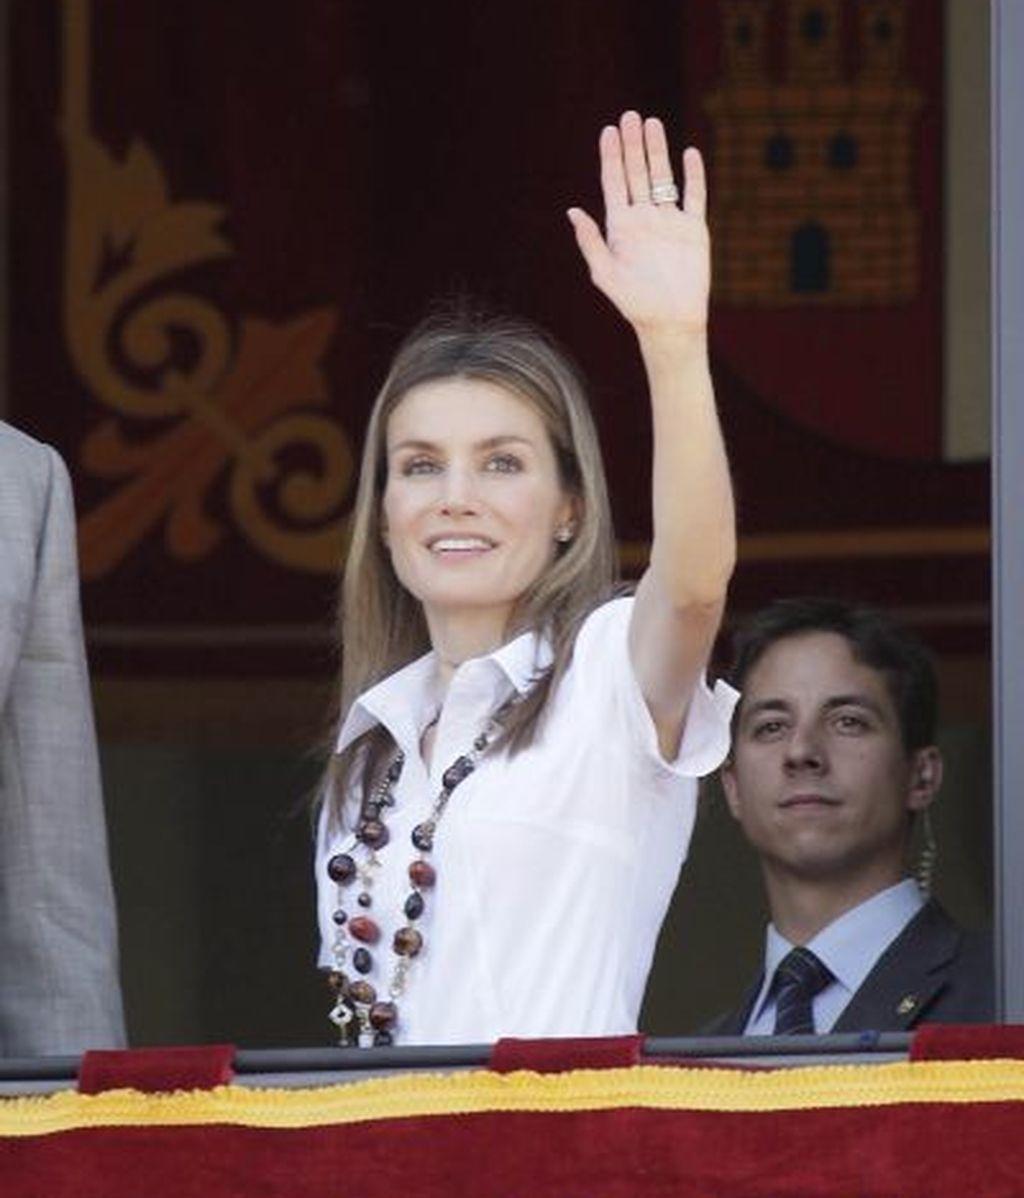 Doña Letizia acapara miradas y aplausos en Alcázar de San Juan